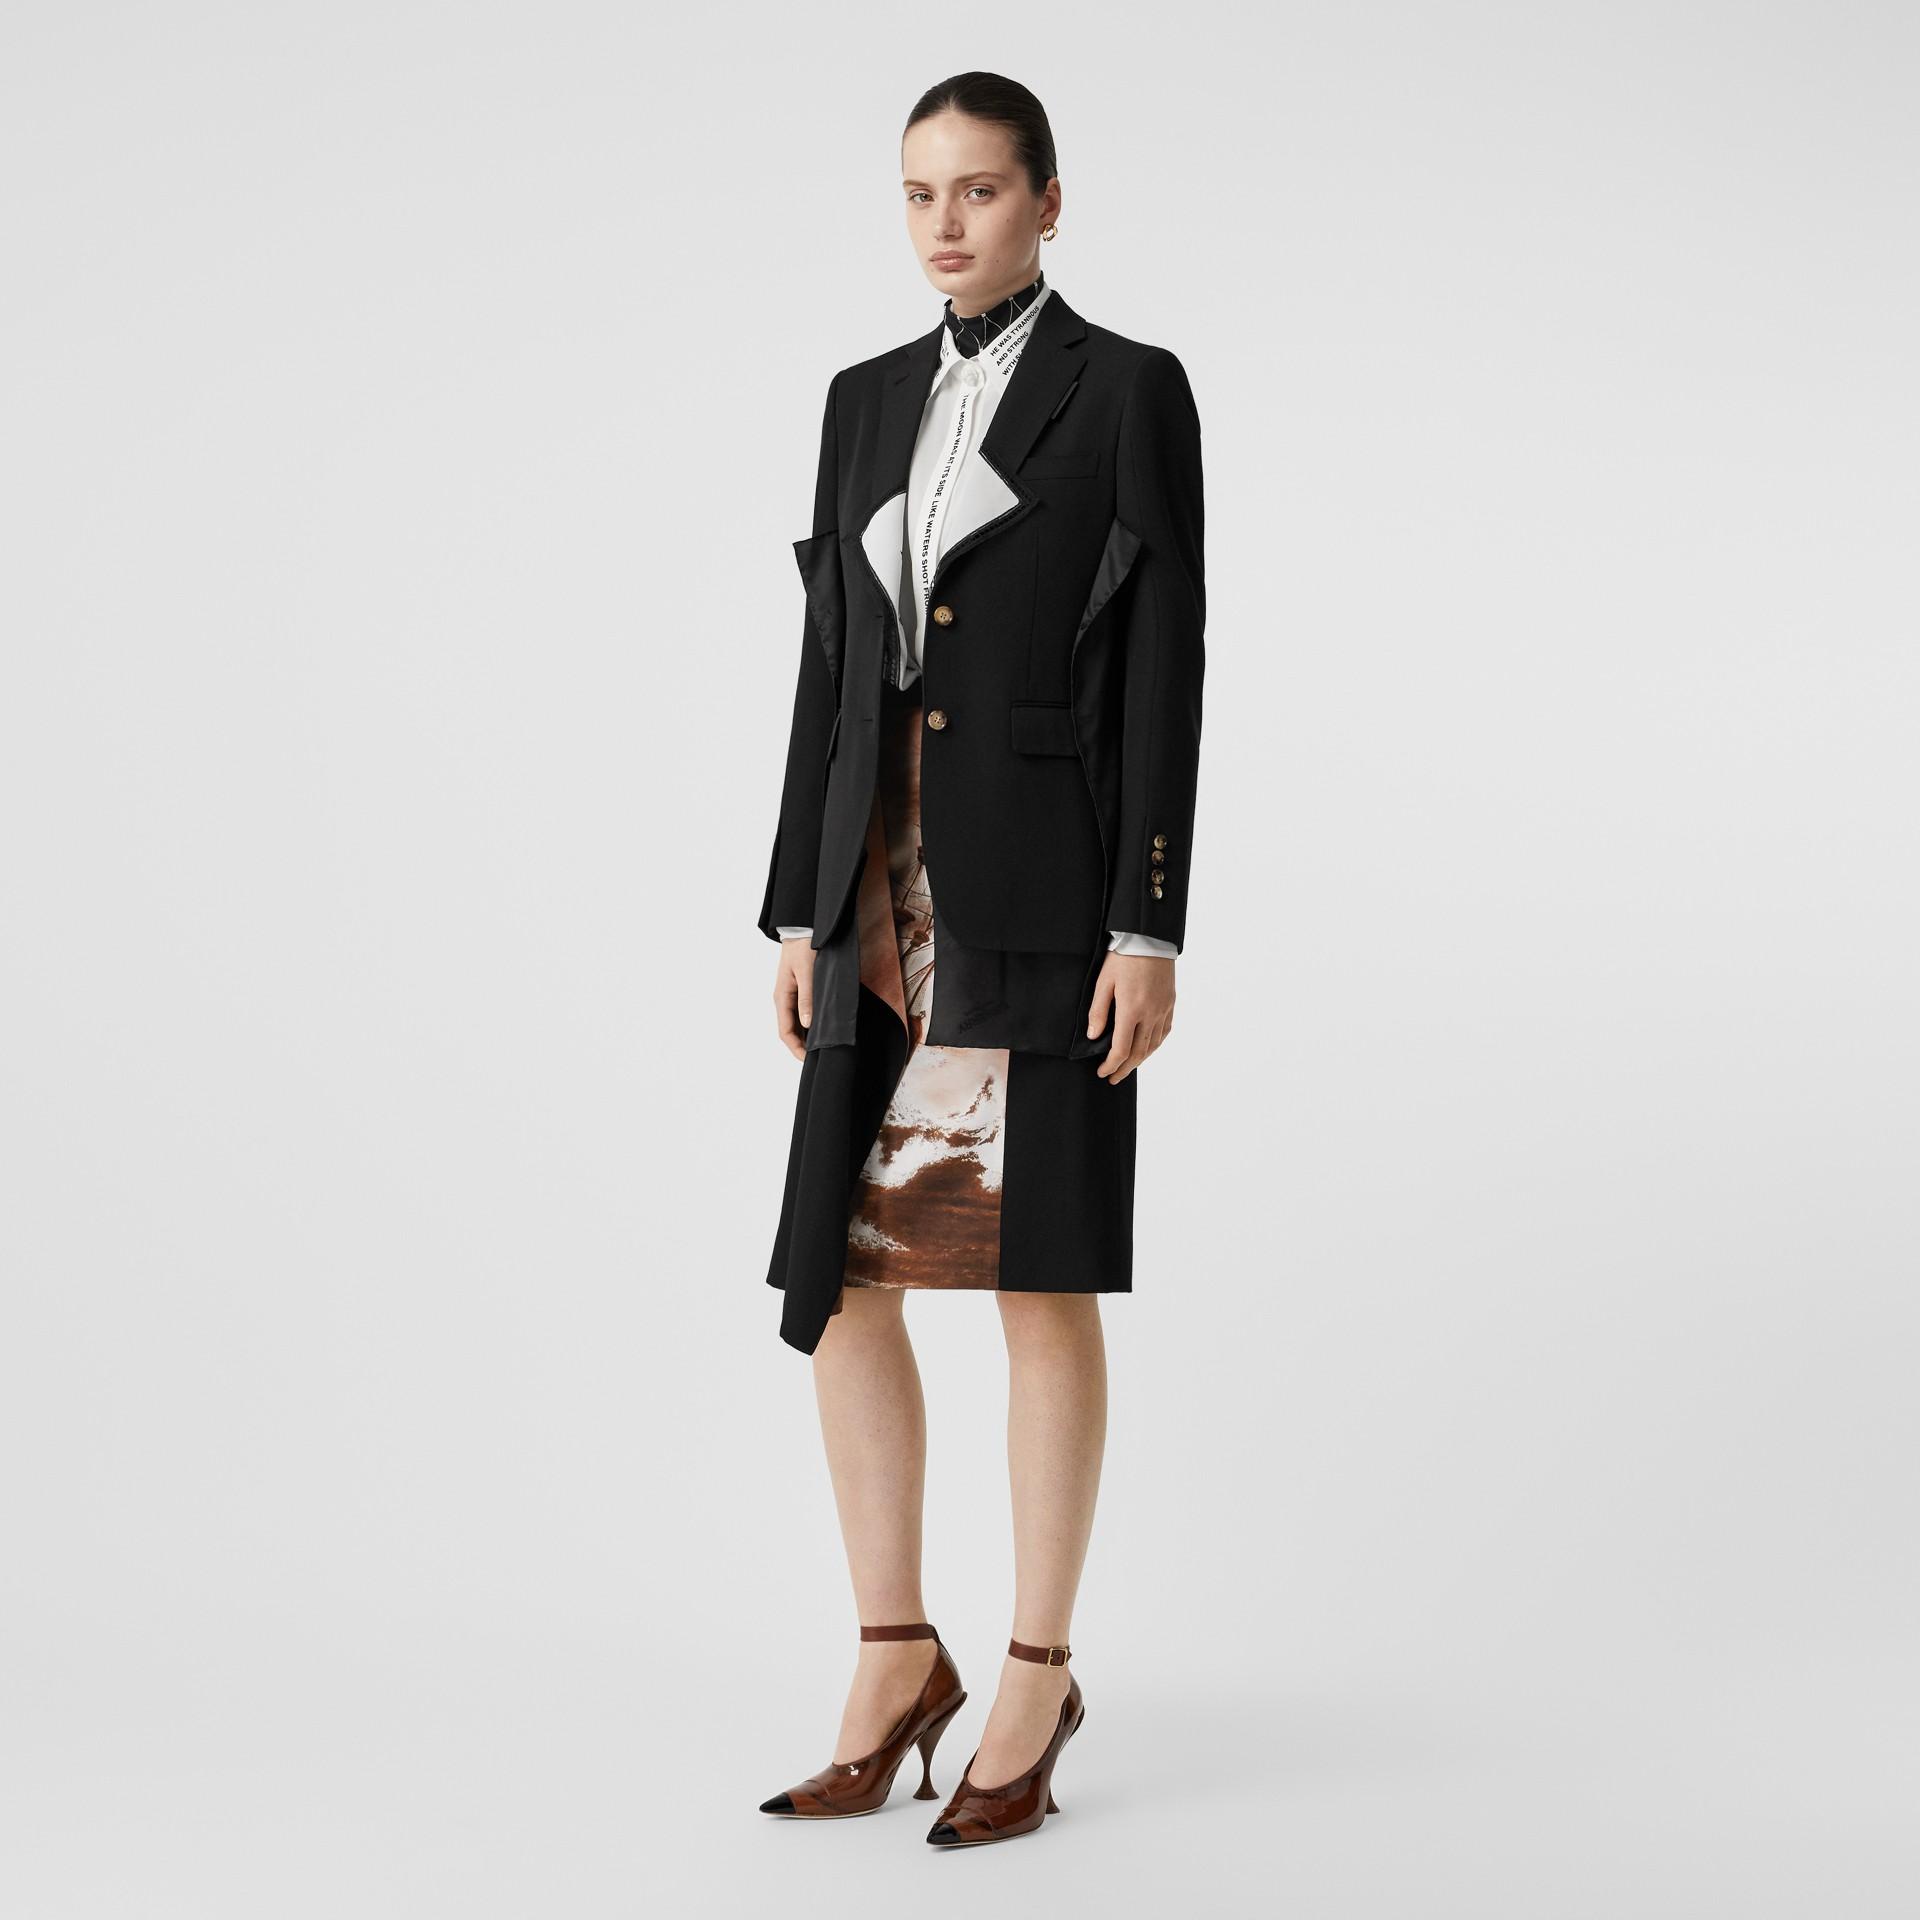 Logo Panel Detail Wool Tailored Jacket in Black - Women | Burberry Australia - gallery image 0